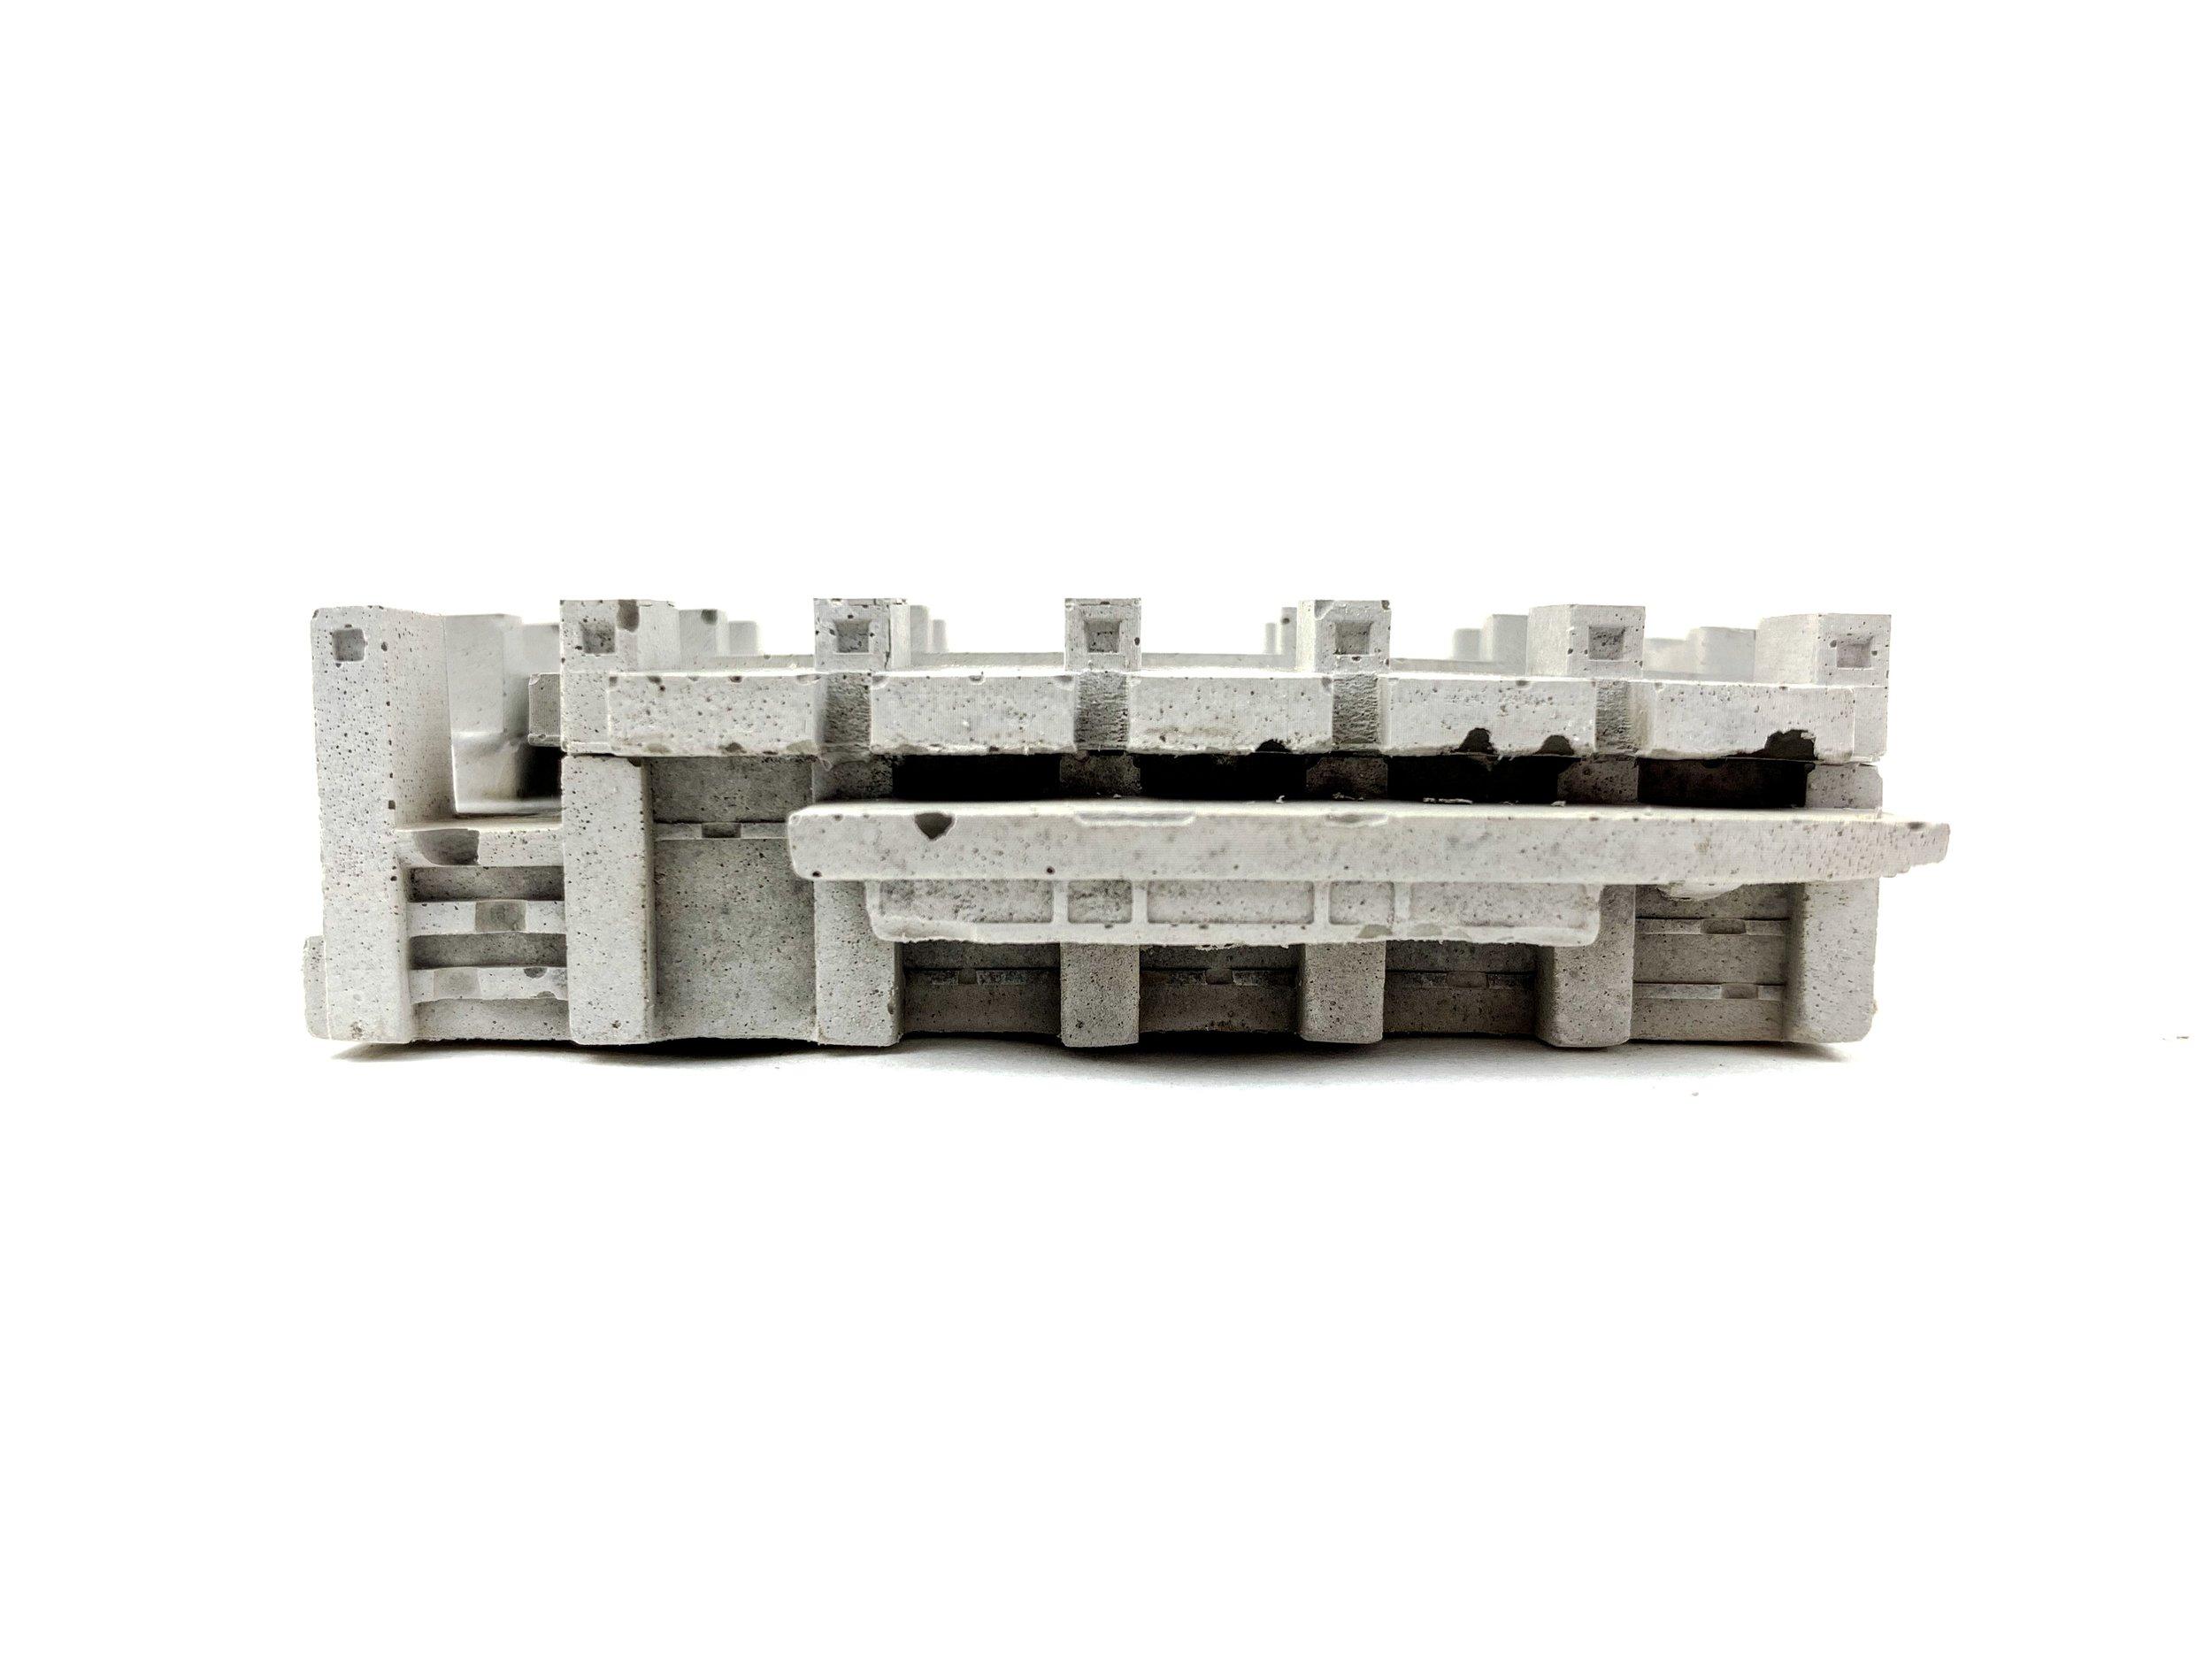 Our mini Concrete Barbican Centre sculpture